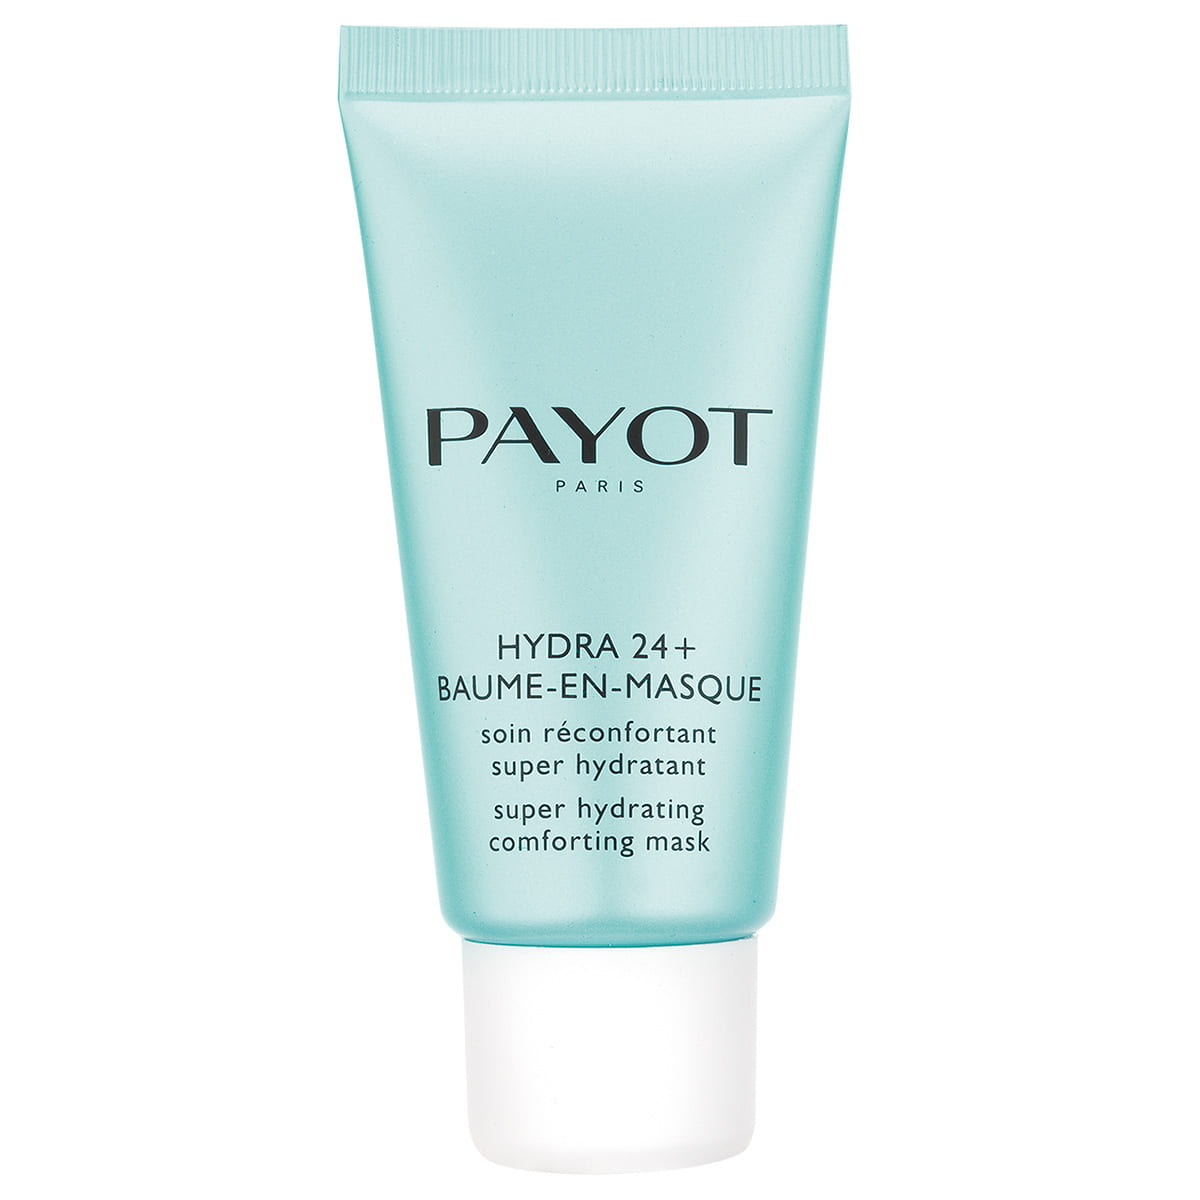 Payot - Hydra 24 + Baume en Masque